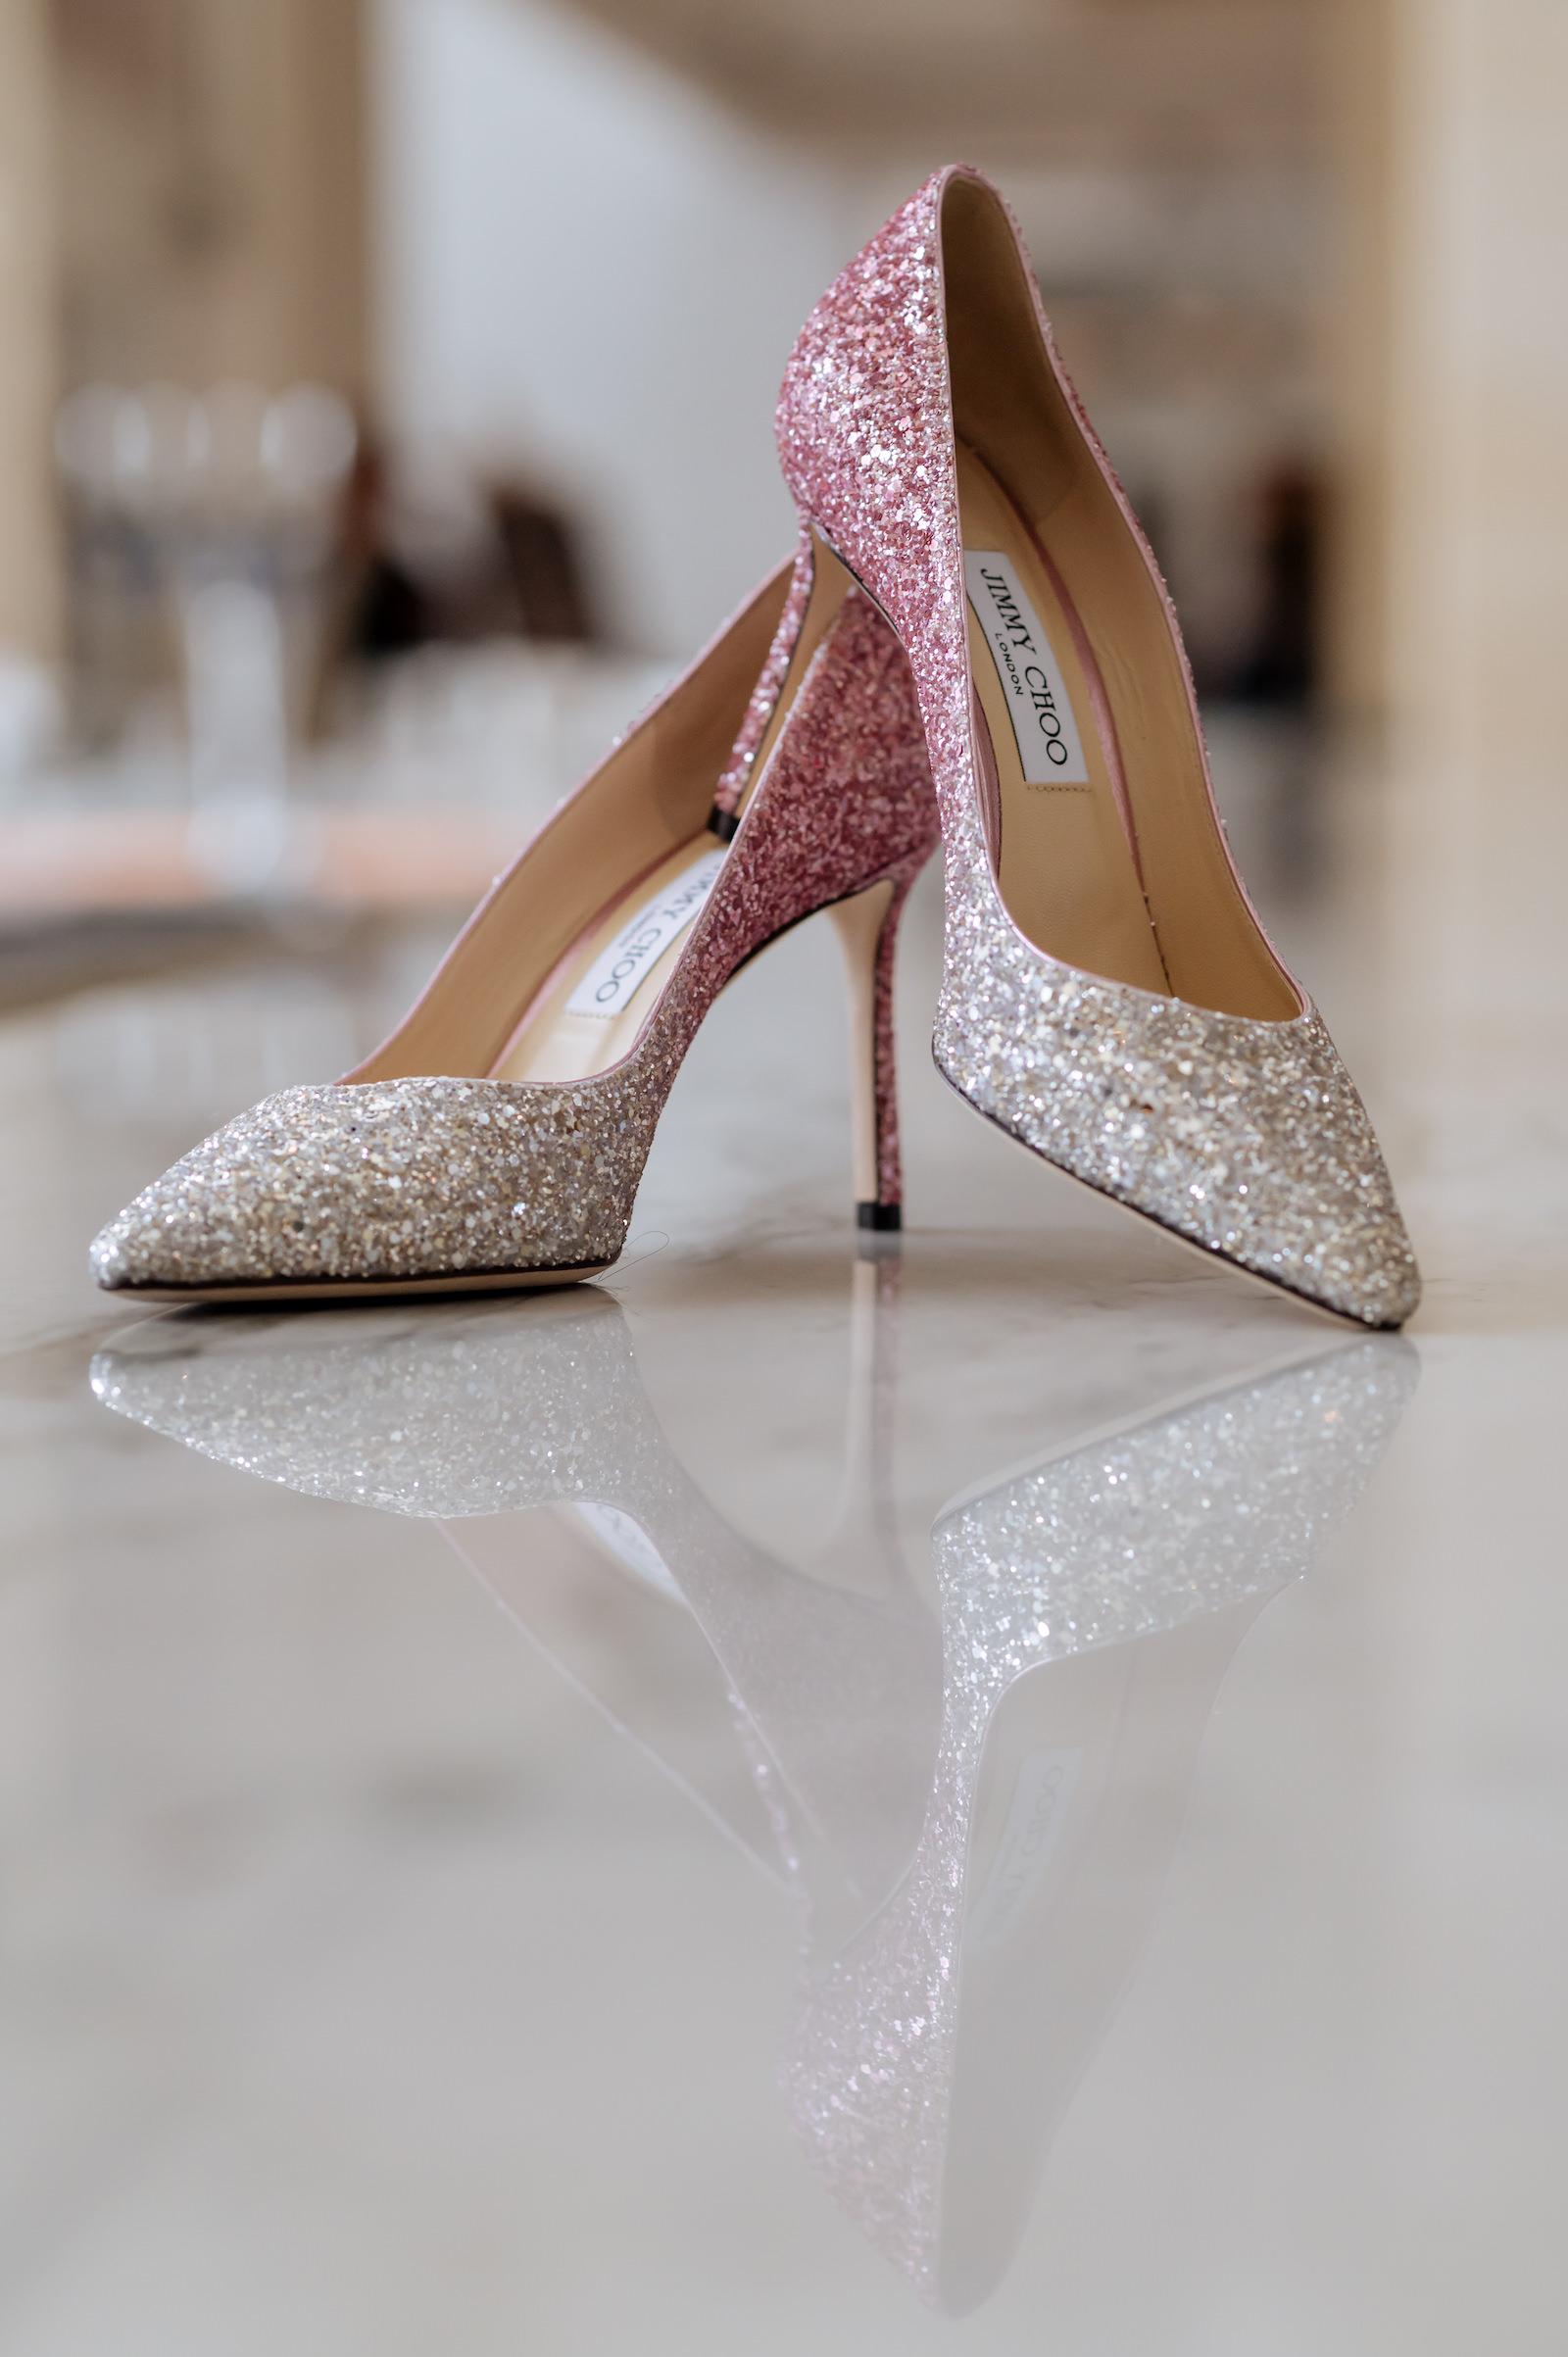 Silver Pink Ombre Glitter Sparkle Jimmy Choo Bride Wedding Shoes Heels